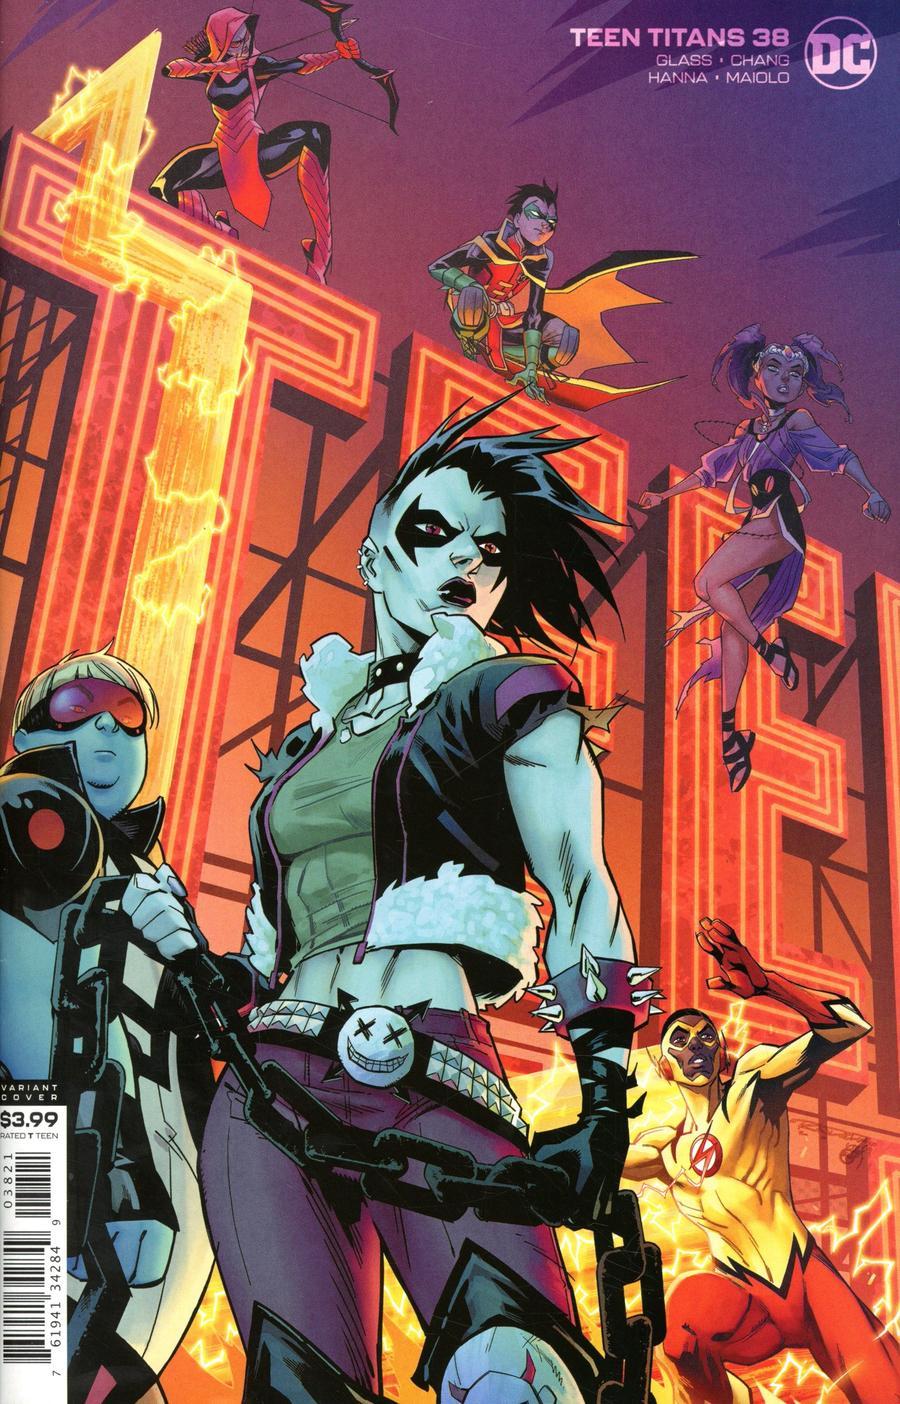 Teen Titans Vol 6 #38 Cover B Variant Khary Randolph Cover